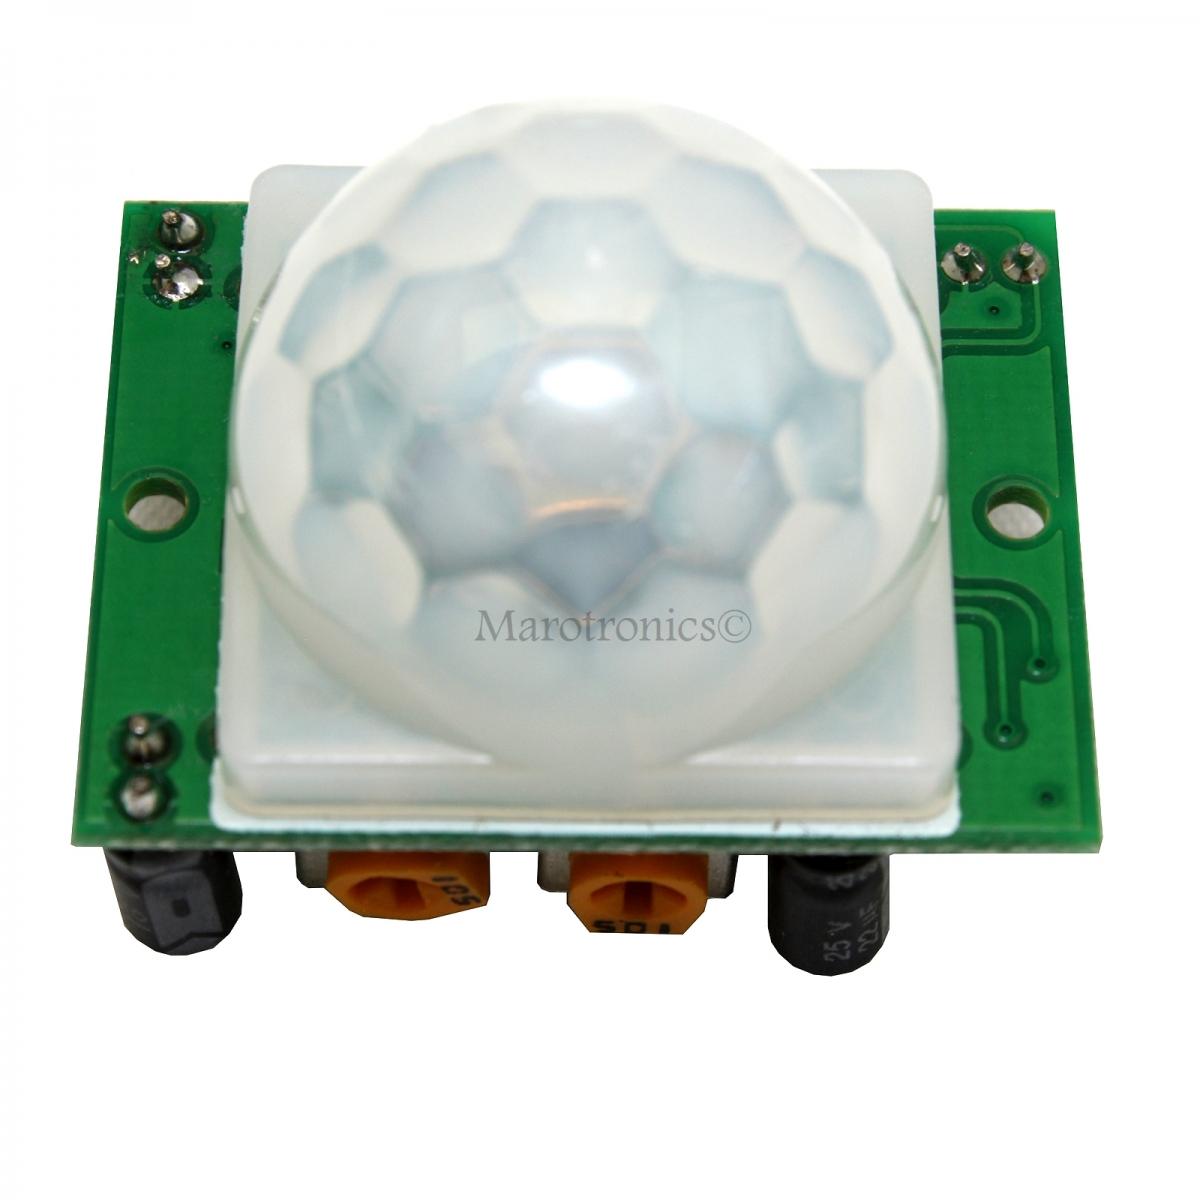 hc sr501 infrarot sensor bewegungsmelder z b f r raspberrypi. Black Bedroom Furniture Sets. Home Design Ideas